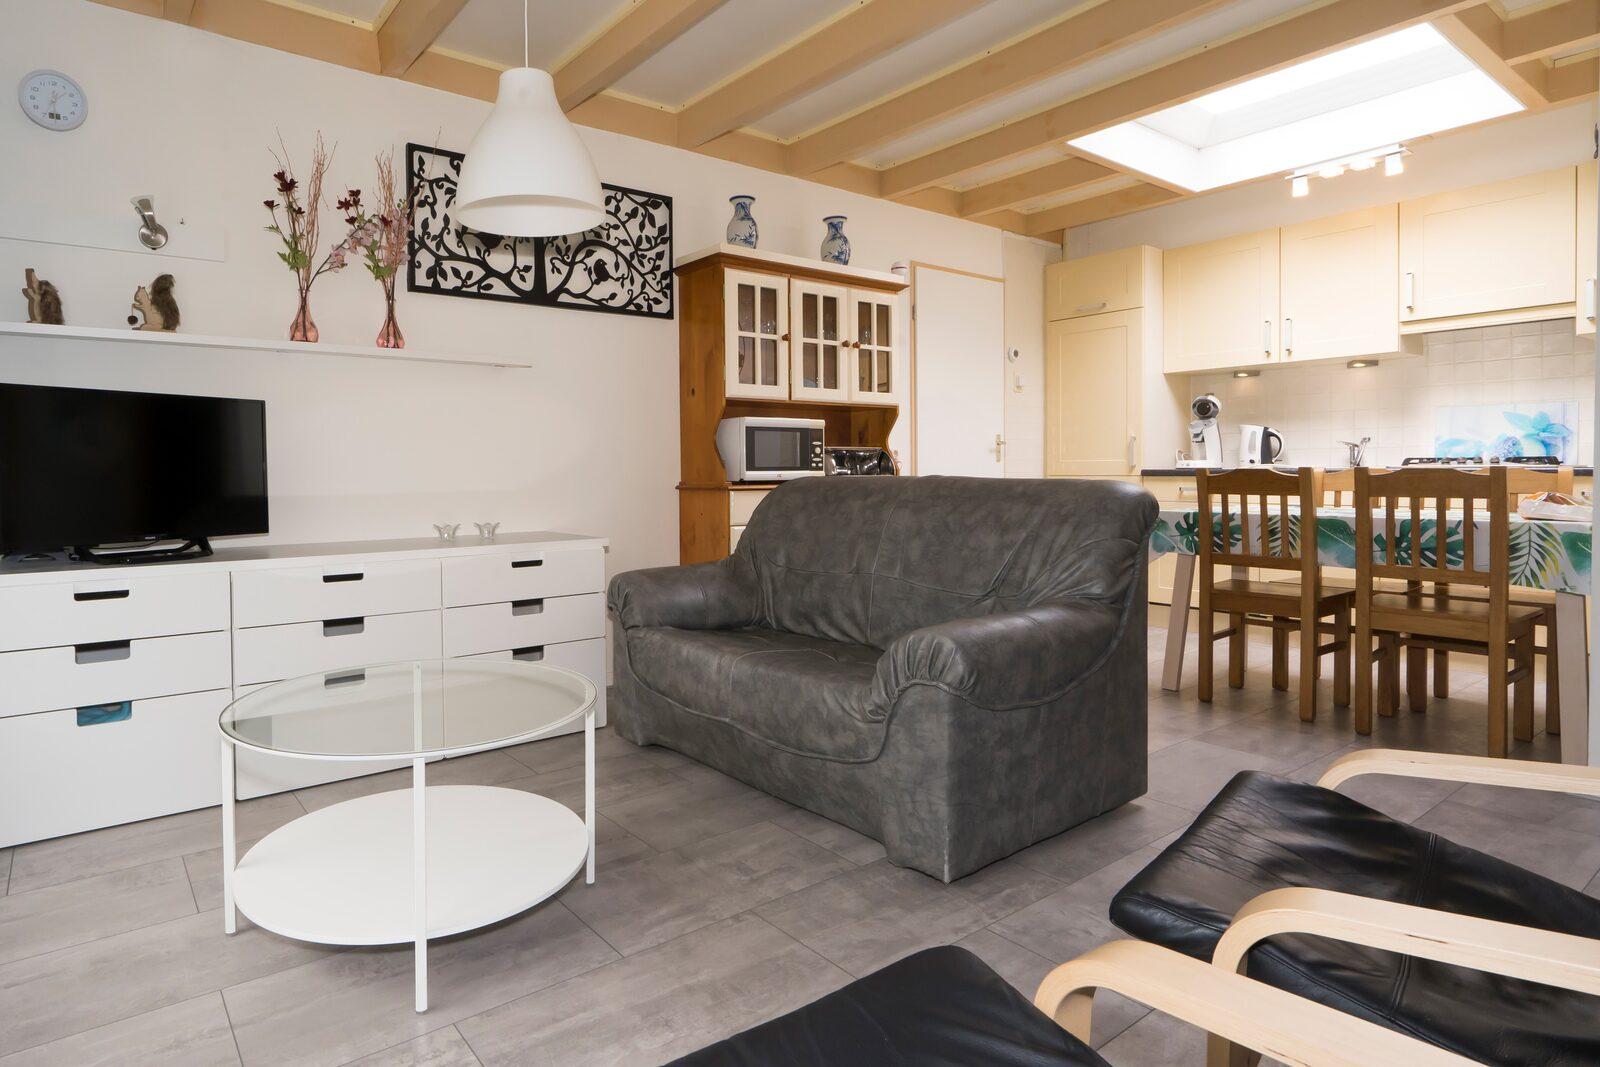 Bungalow 200 - Select bungalow